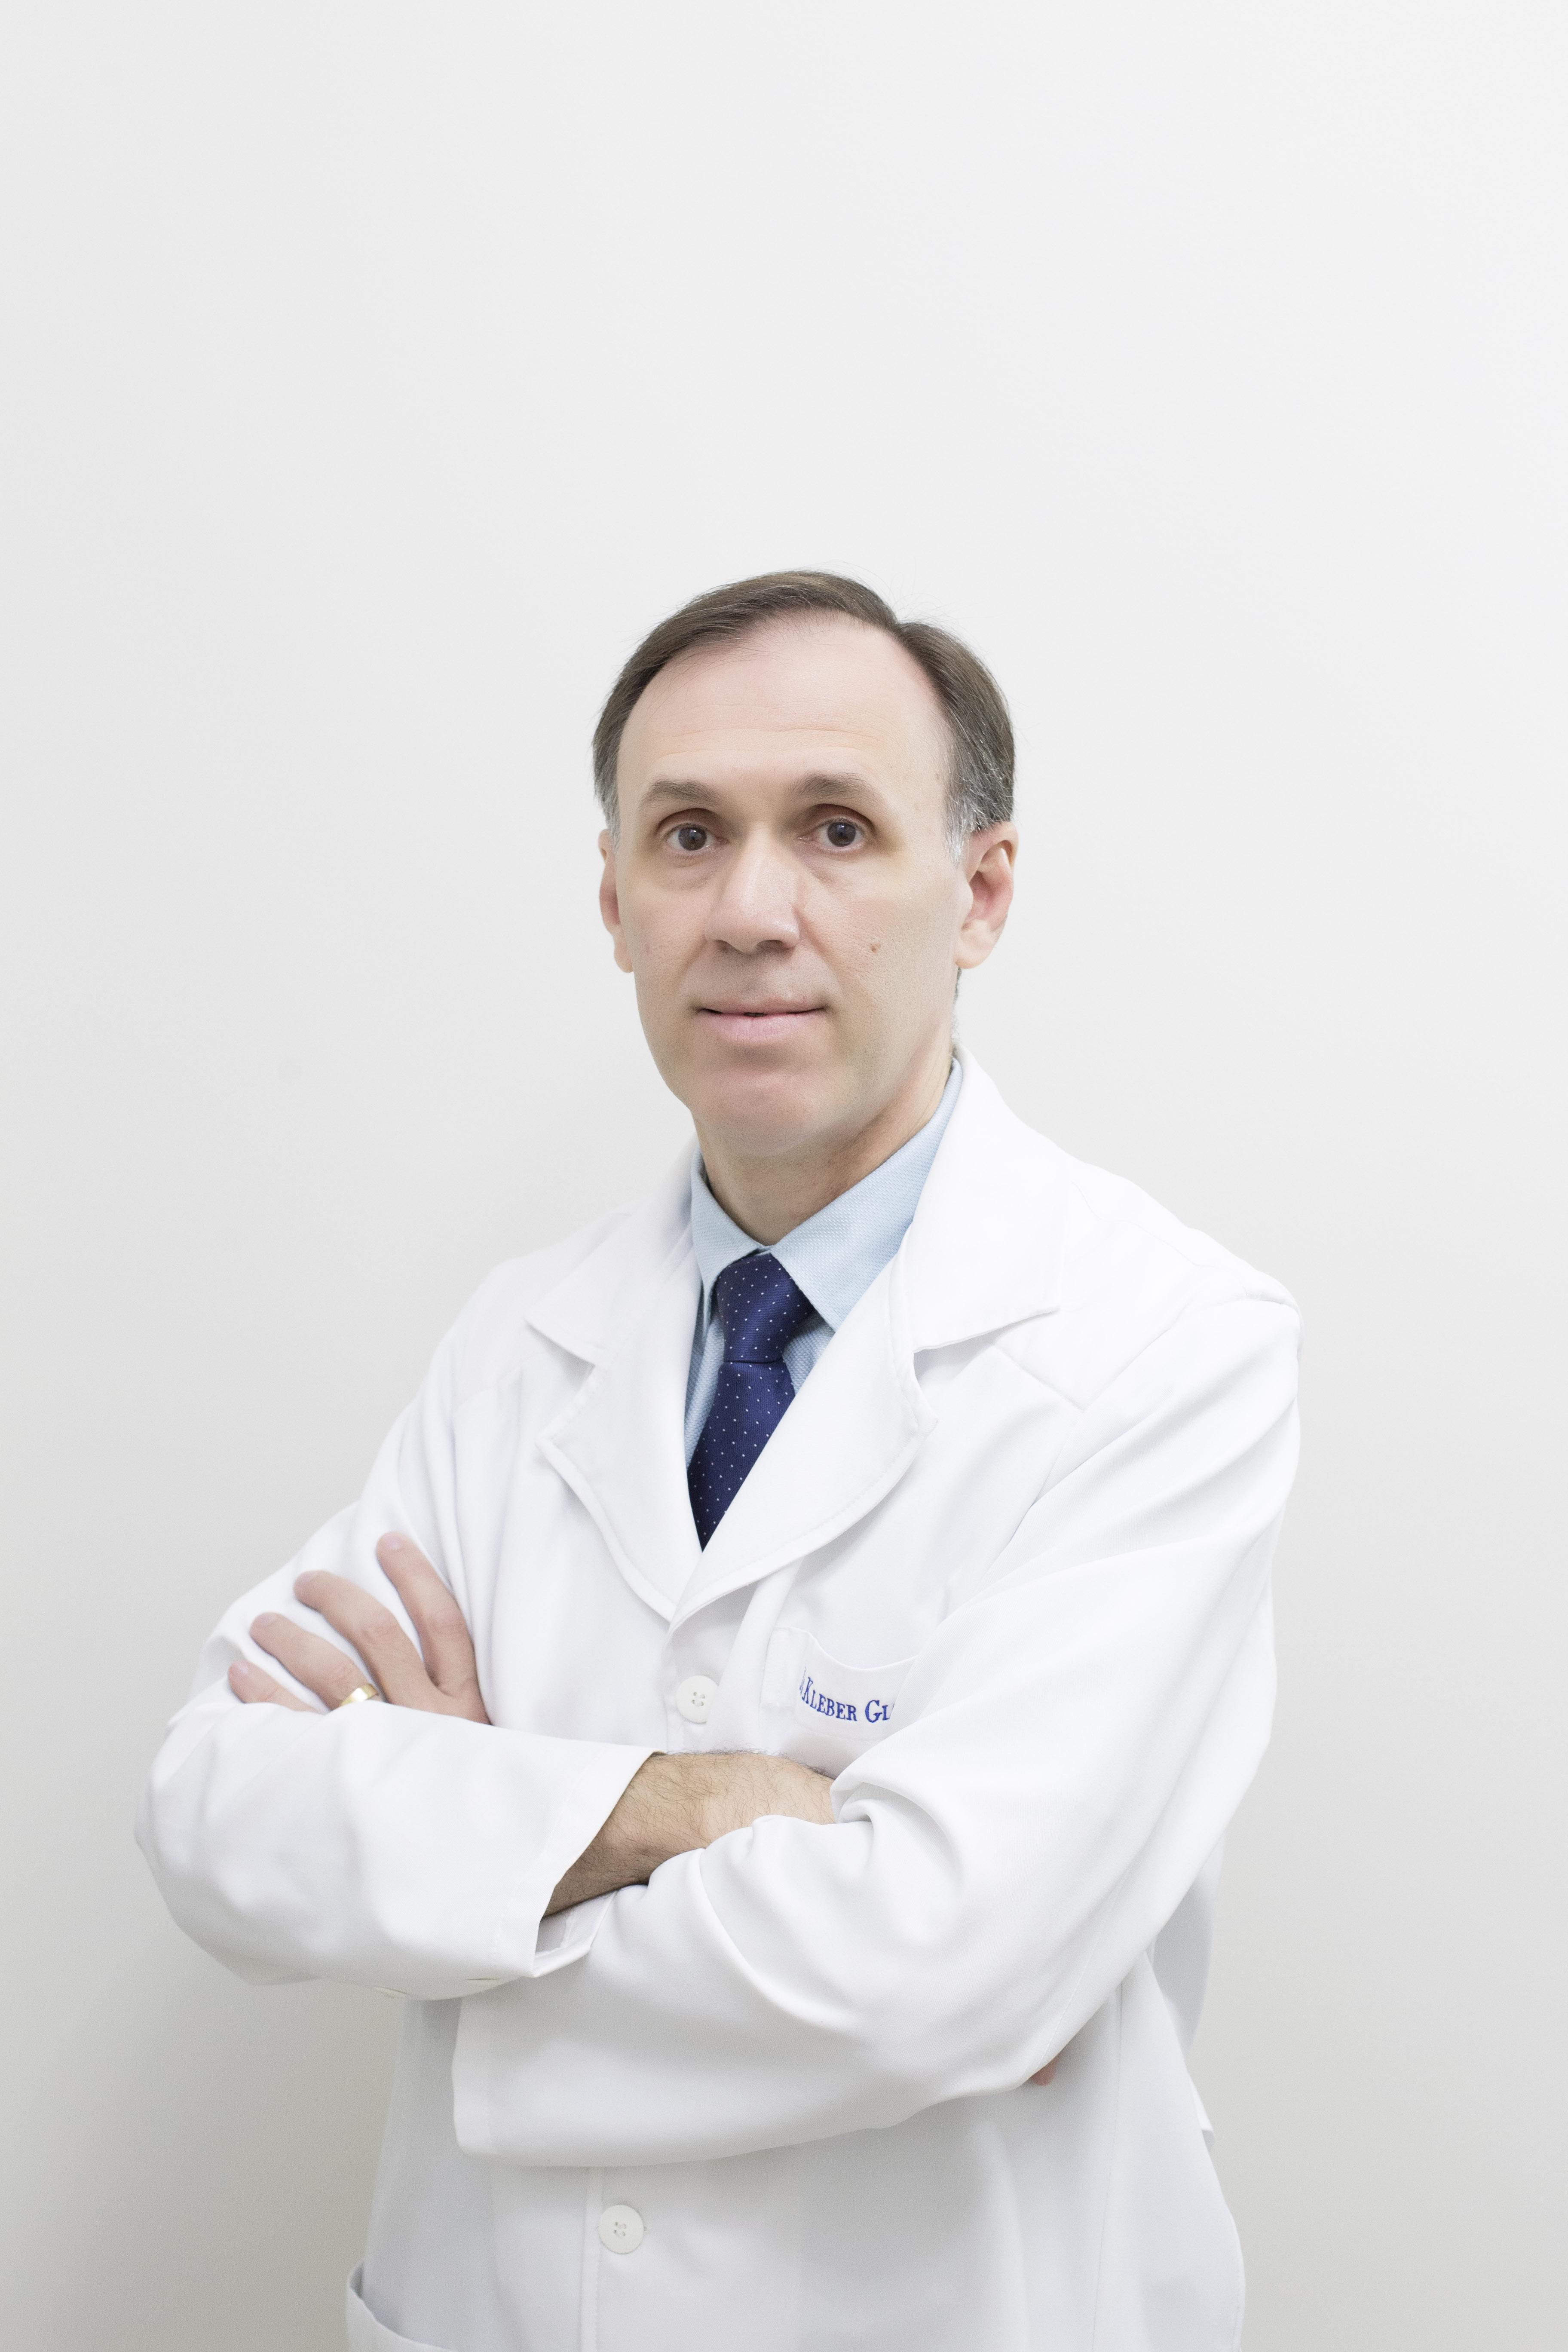 Dr Kleber Giafferis